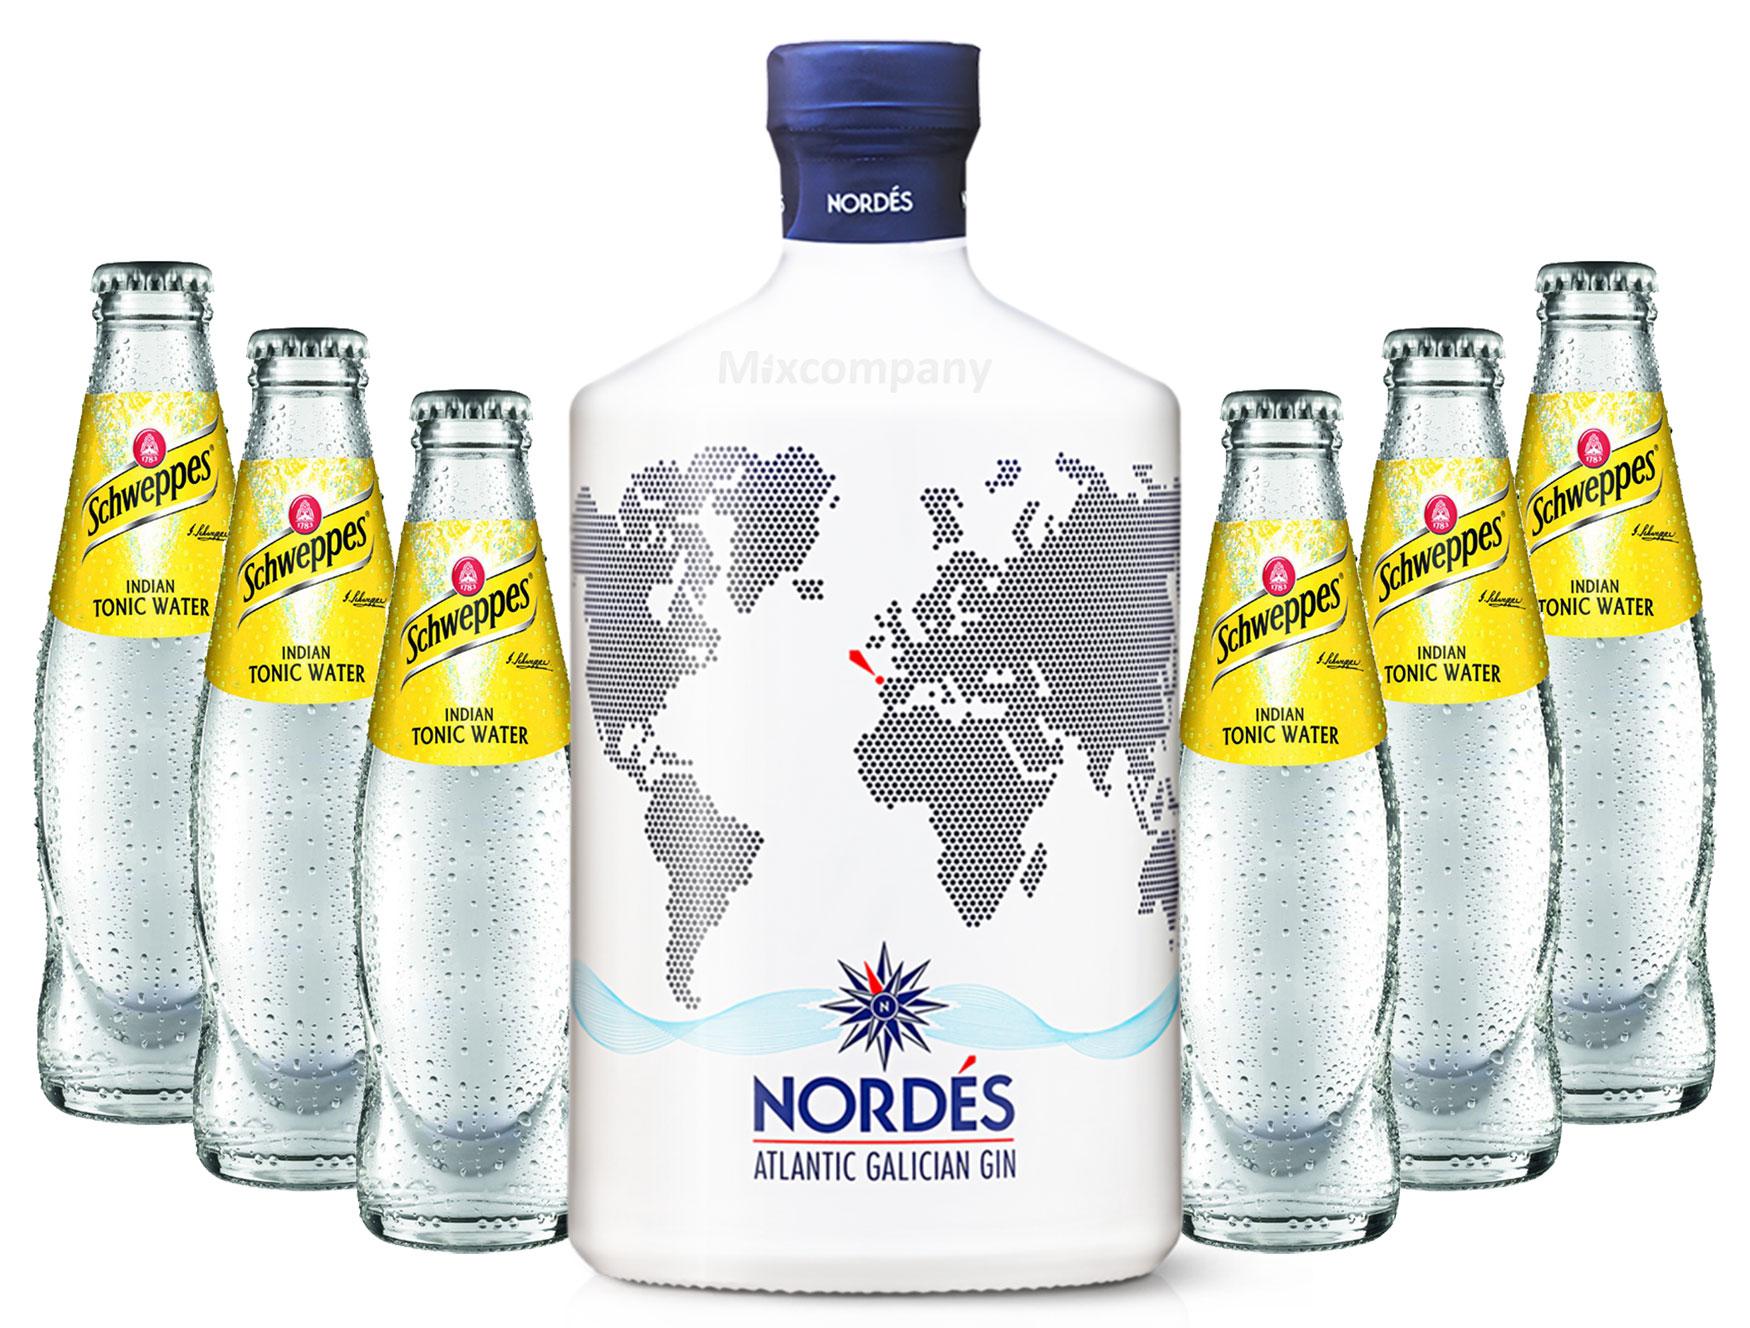 Nordes Atlantic Galician Gin aus Galizien 0,7l (40% Vol) + 6x Schweppes Indian Tonic Water 0,2l MEHRWEG inkl. Pfand- [Enthält Sulfite]